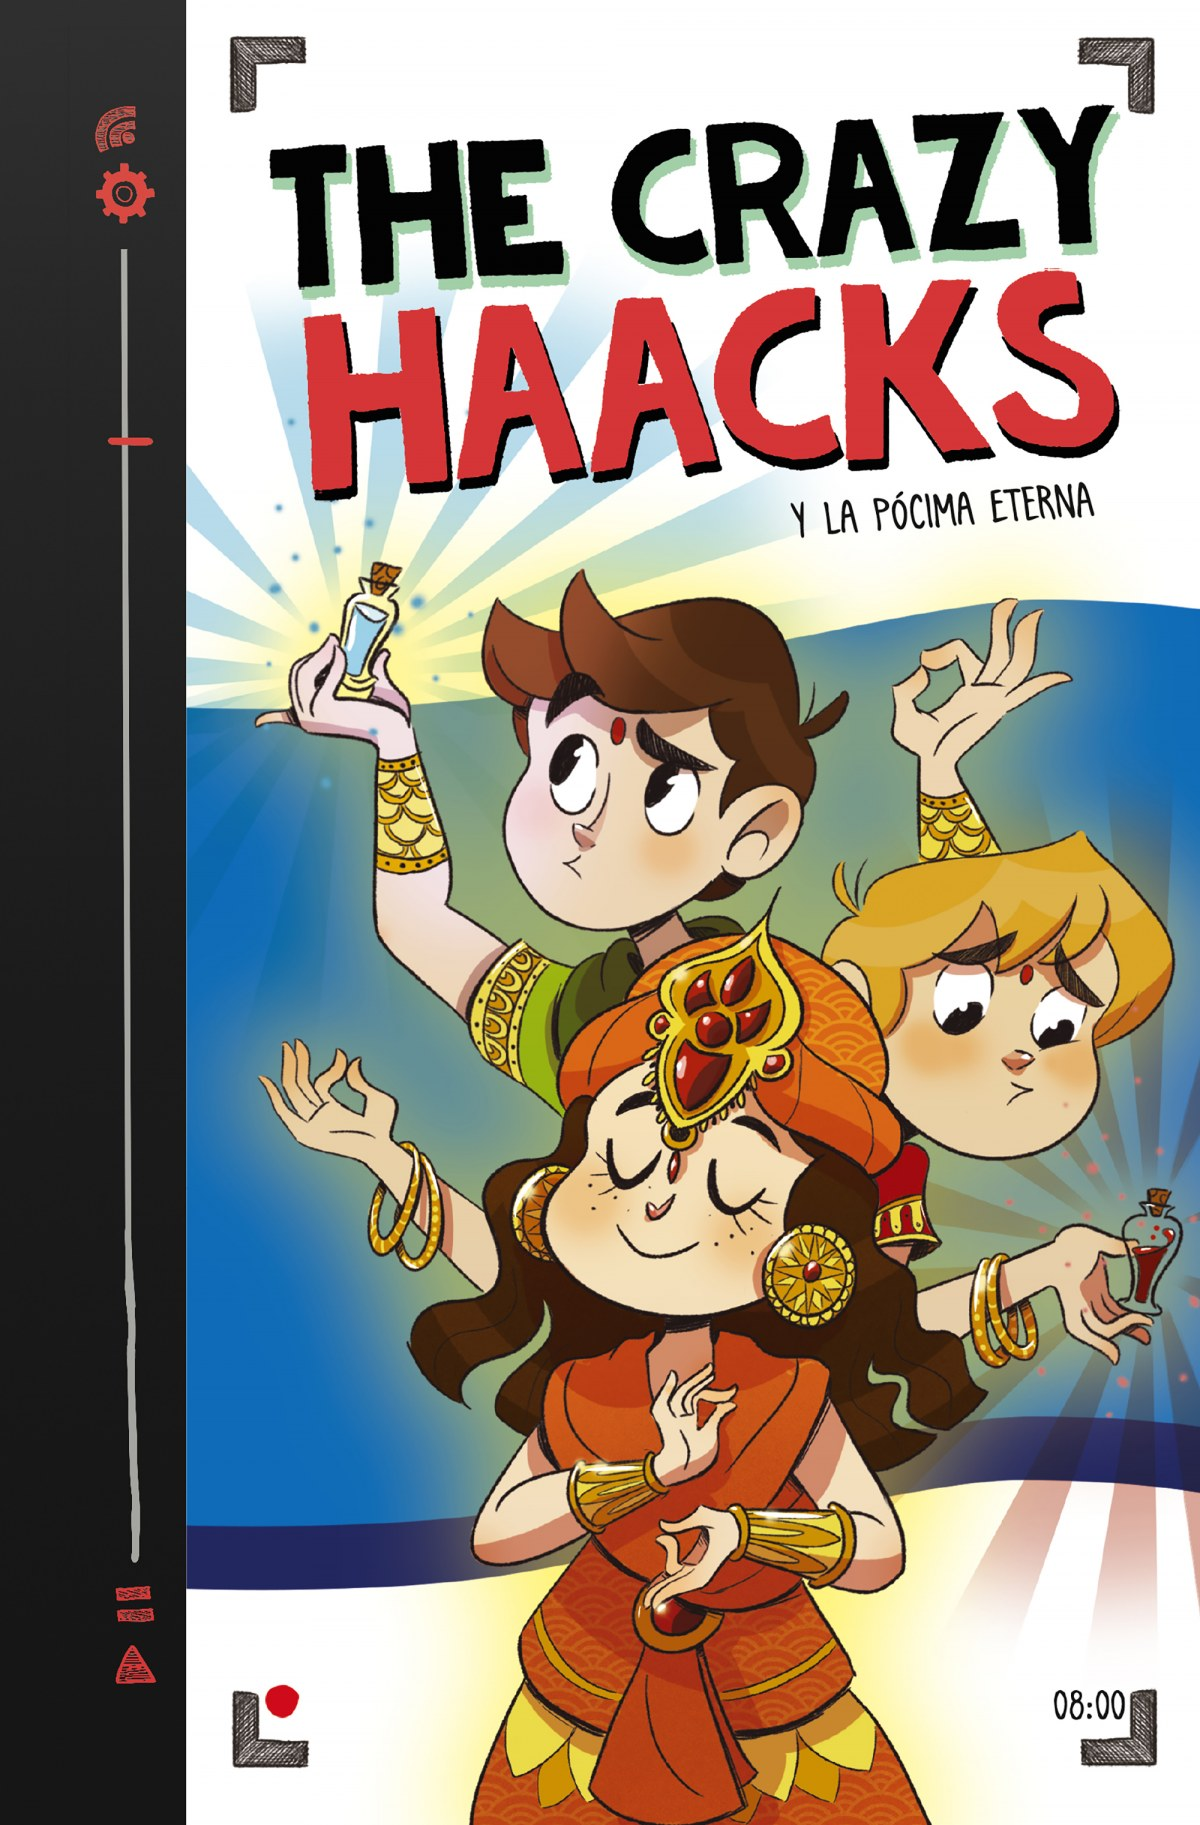 The Crazy Haacks y la pócima eterna (Serie The Crazy Haacks 8) 9788418038198